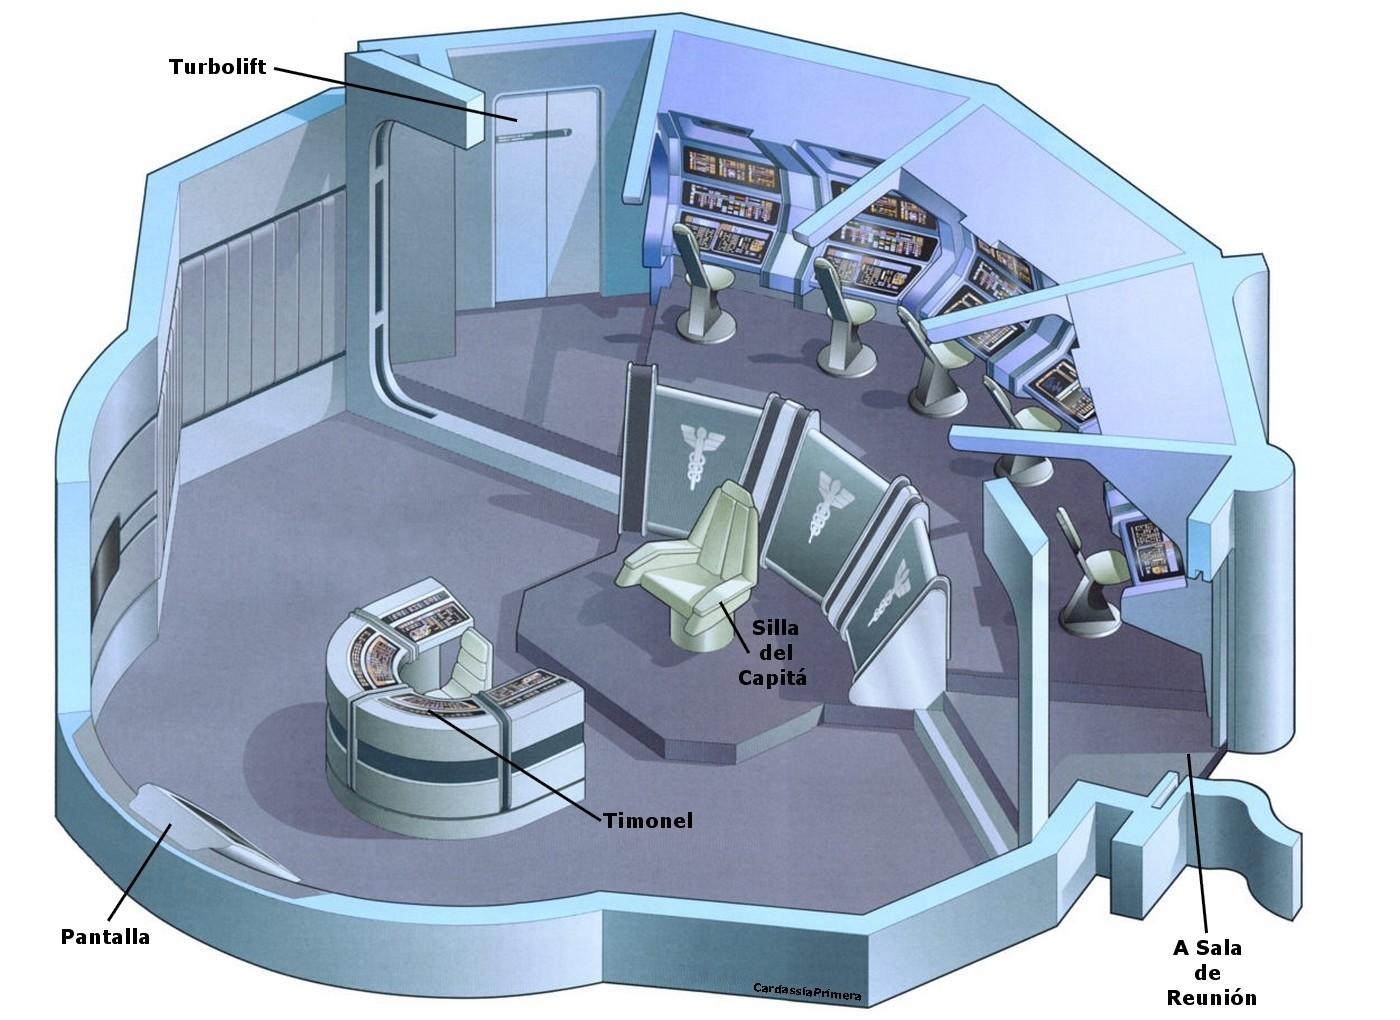 Olympic-Cl-USS-Pasteur-Bridge Uss Defiant Schematics on uss prometheus, delta flyer schematics, uss reliant schematics, uss voyager, uss yamaguchi, deep space nine schematics, uss vengeance star trek, runabout schematics, uss reliant deck plans, uss titan schematics, uss excalibur, uss excelsior, star trek ship schematics, millennium falcon schematics, uss lst schematic, uss equinox, space station schematics, uss valiant schematics, uss diligent, uss enterprise,